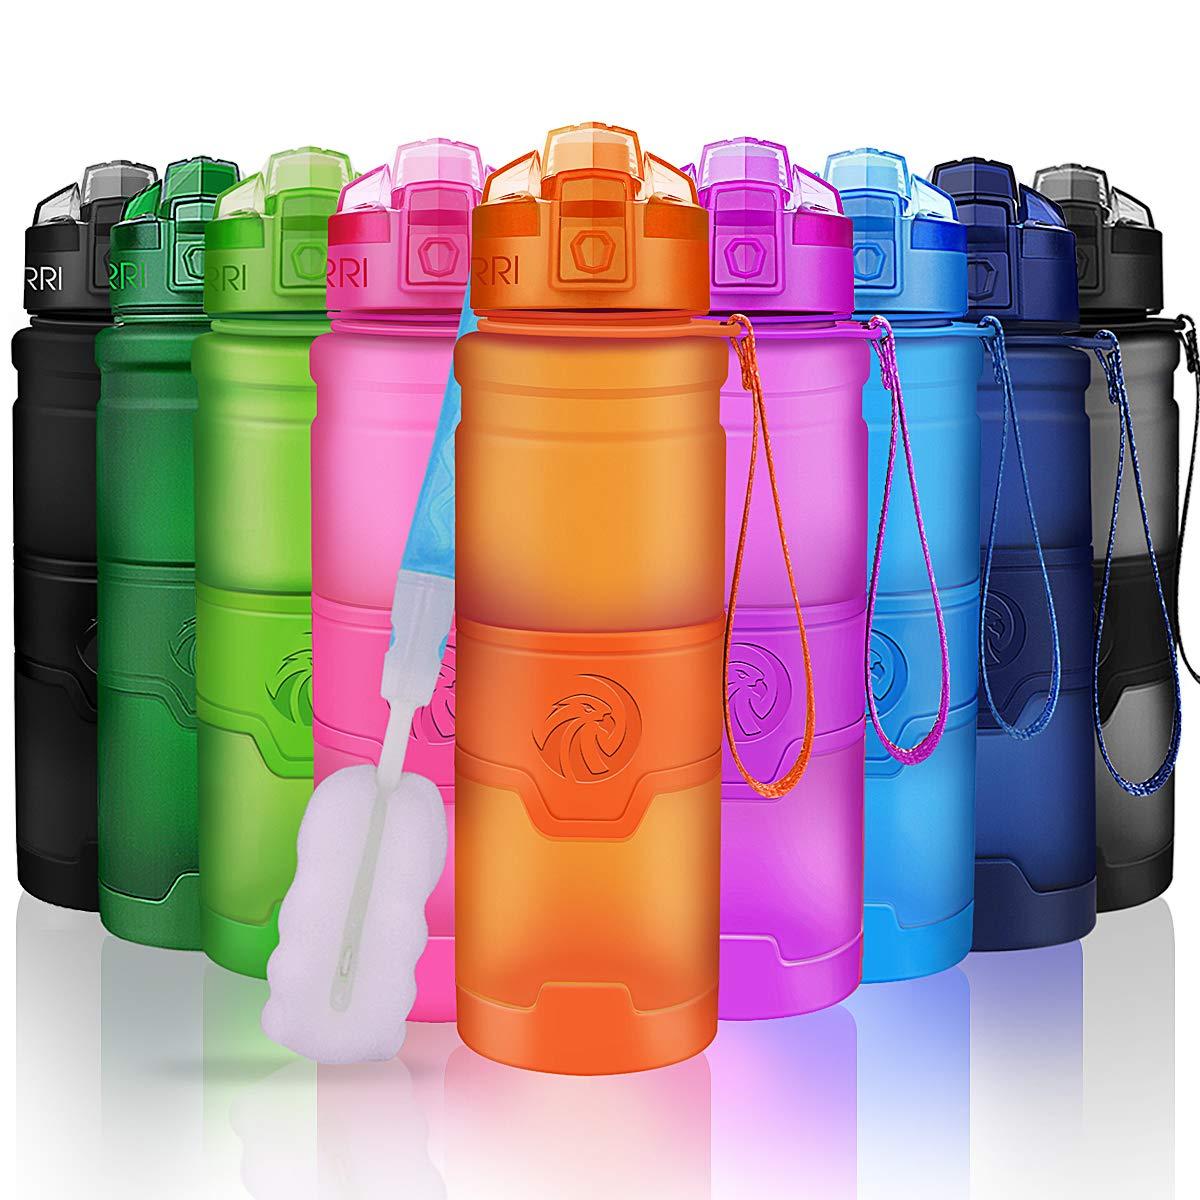 ZORRI Plastic Bottles Outdoors Lockable